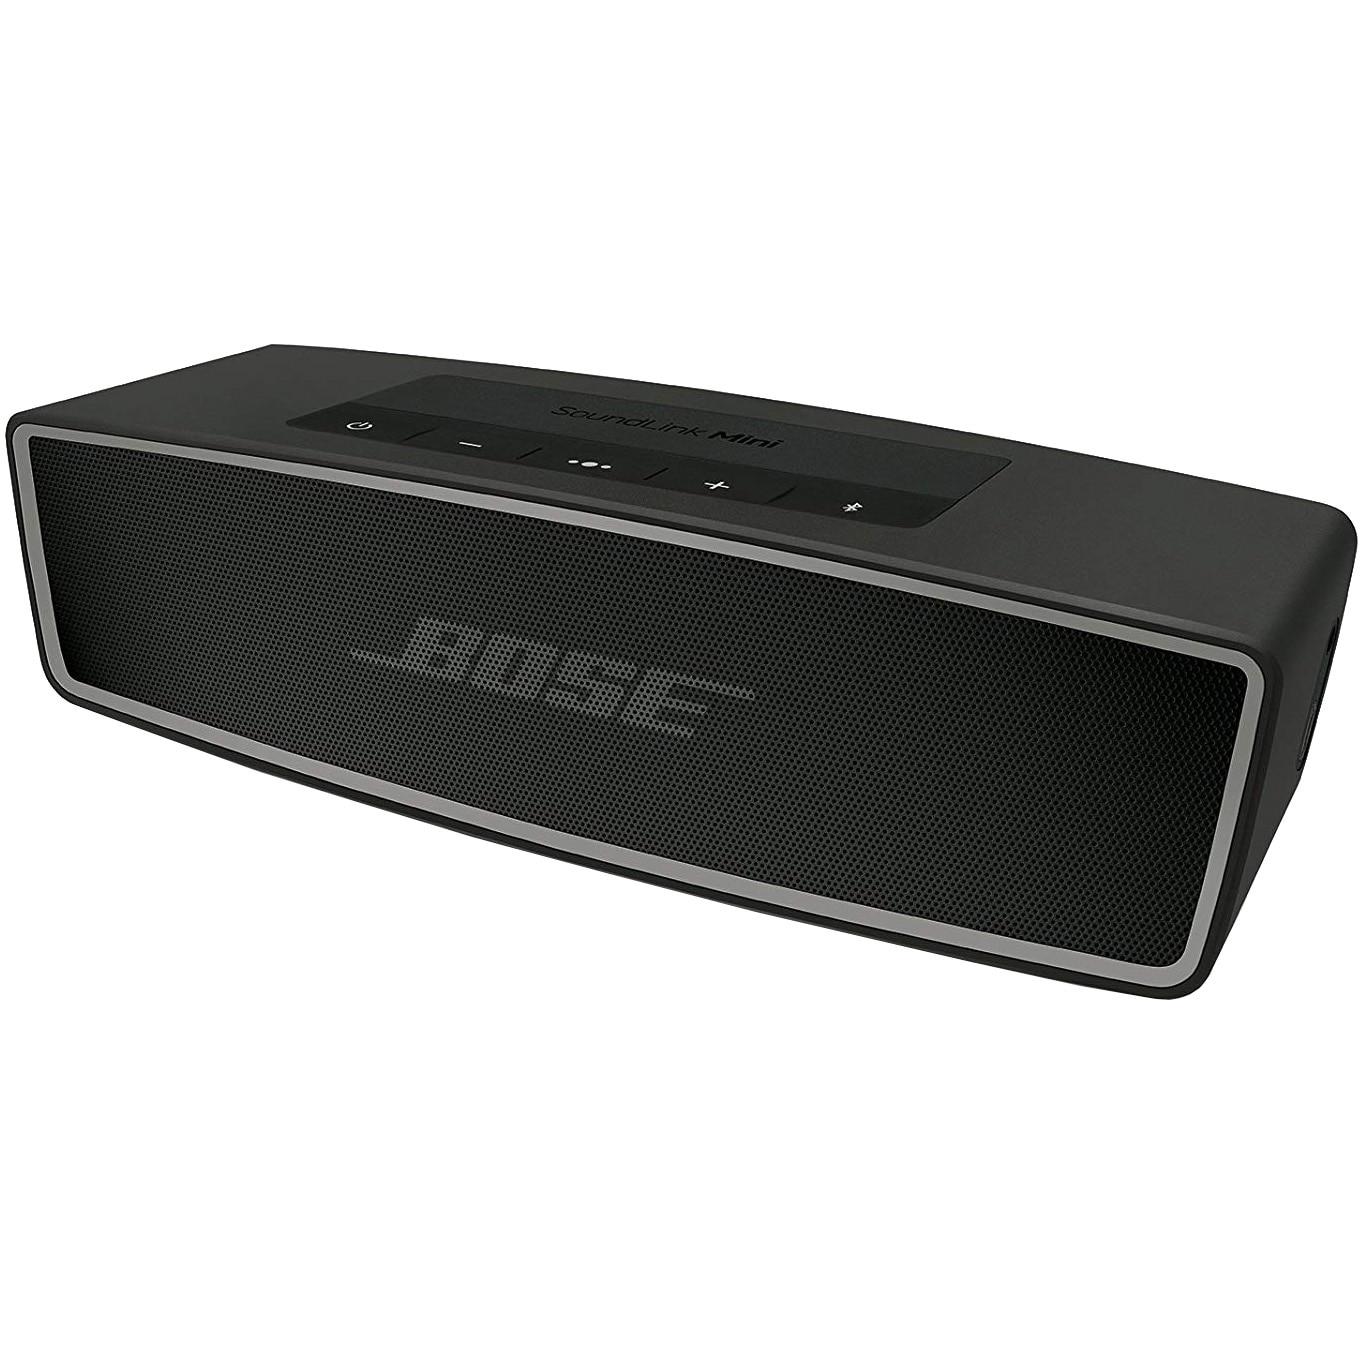 Fotografie Boxa portabila Bose SoundLink Mini Bluetooth Series II, negru